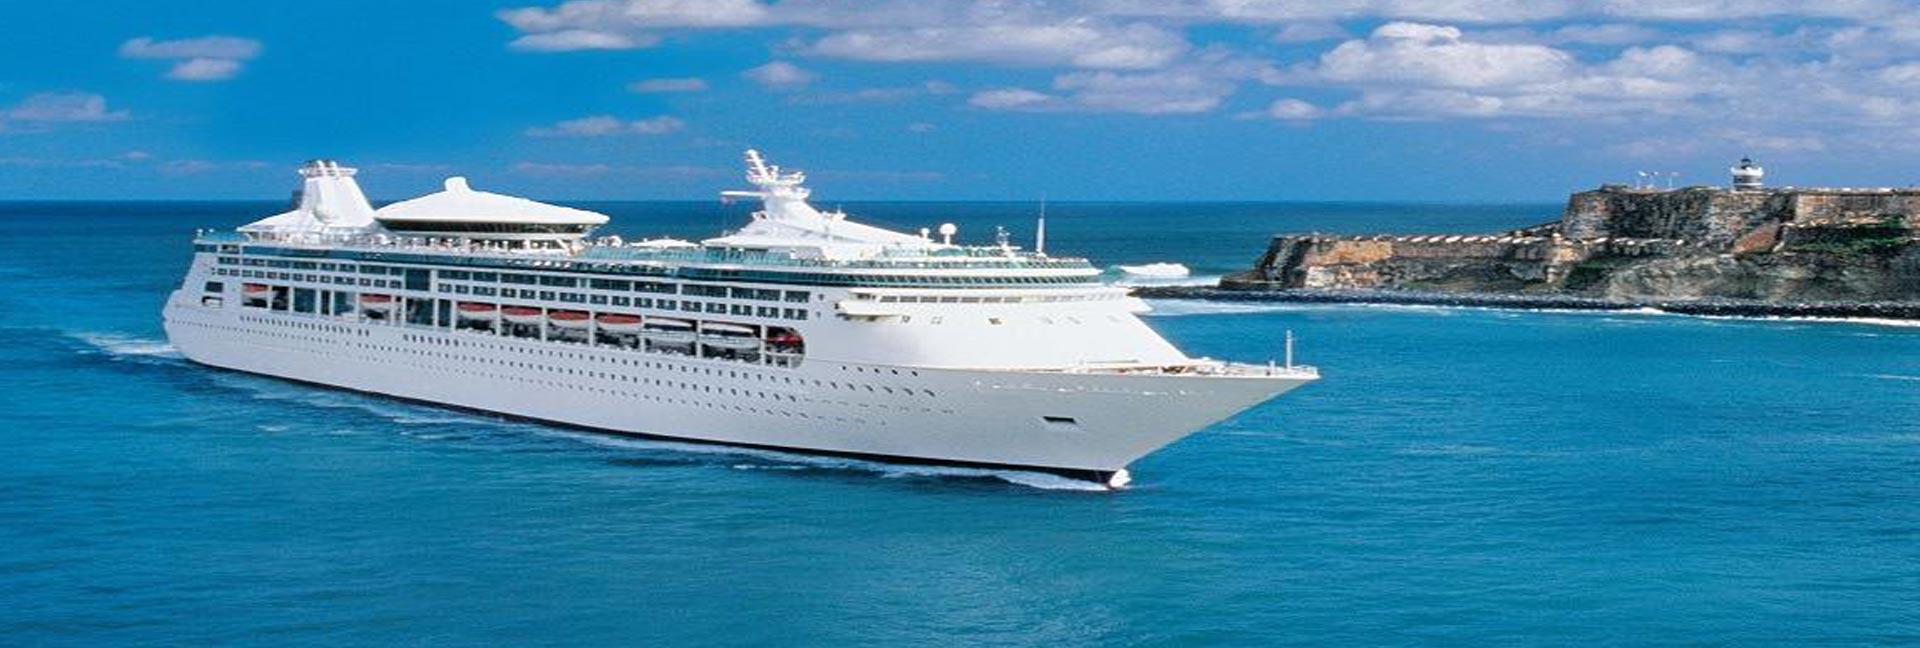 Celebrity Cruise Lines Destinations Casino